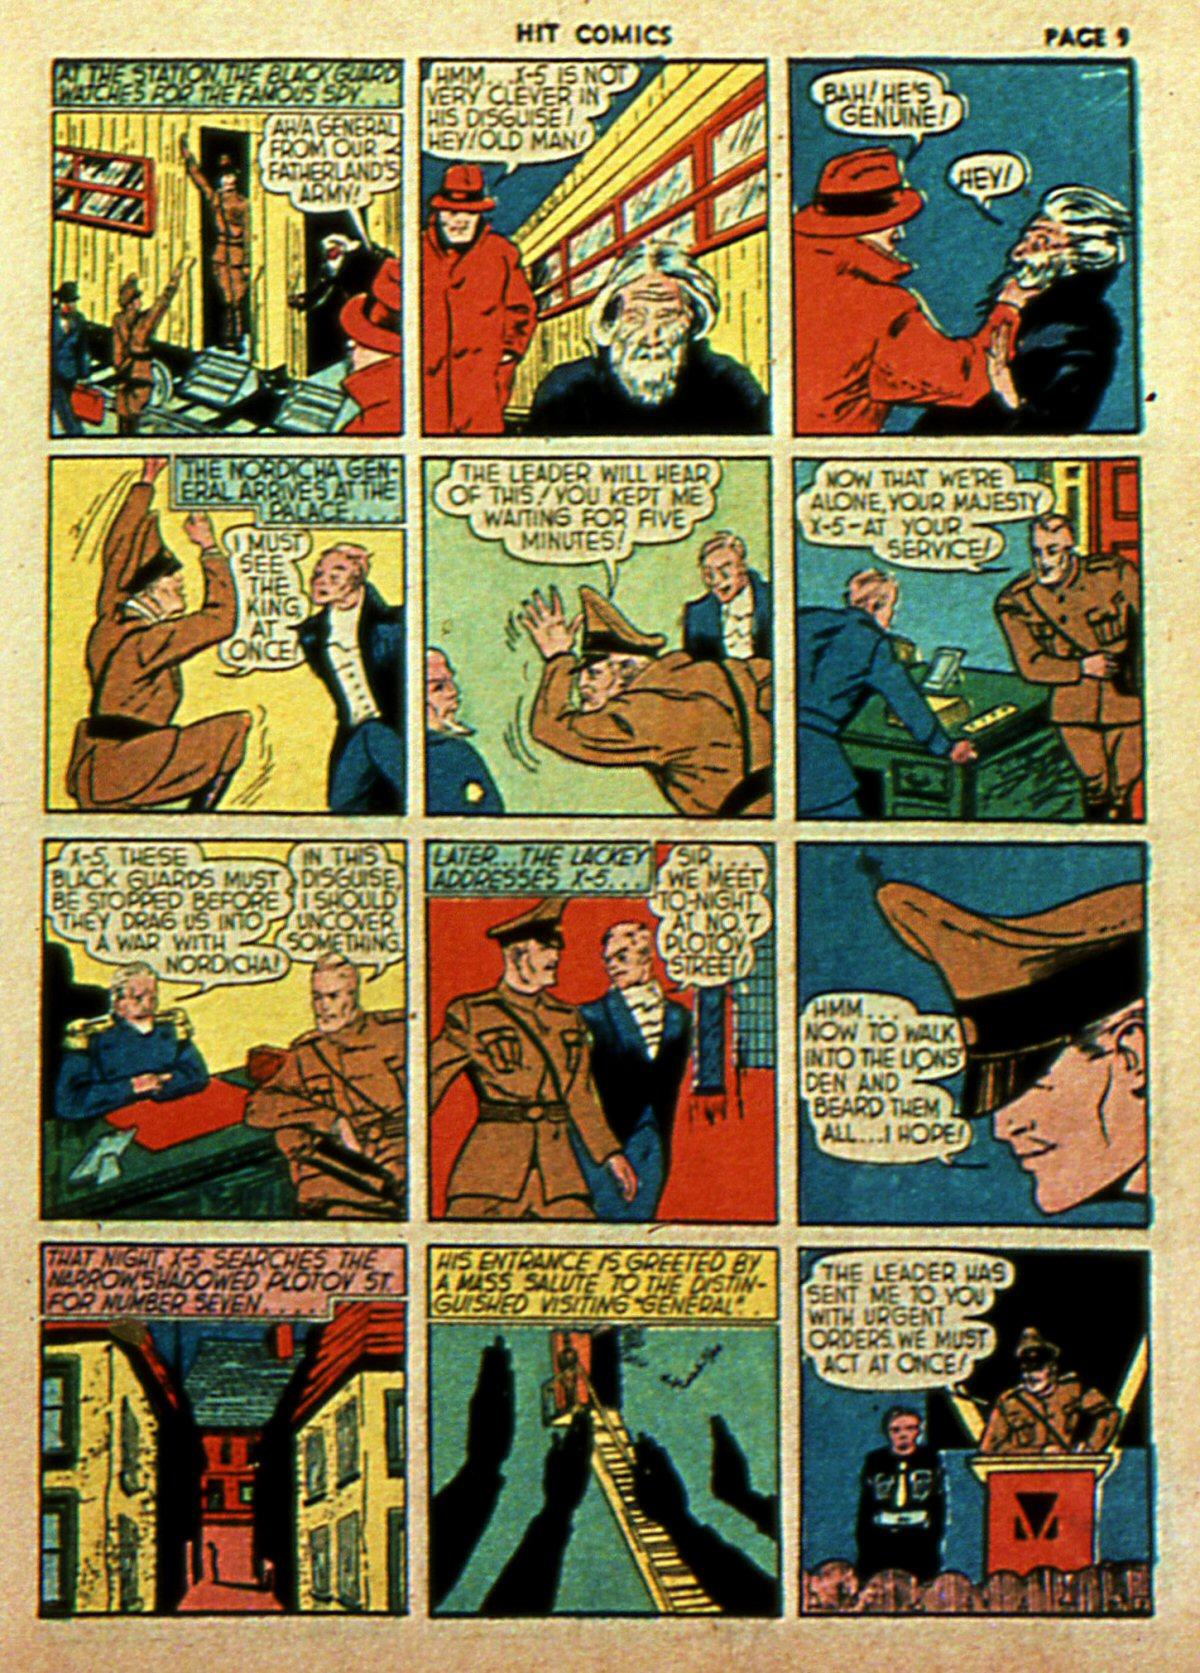 Read online Hit Comics comic -  Issue #2 - 11